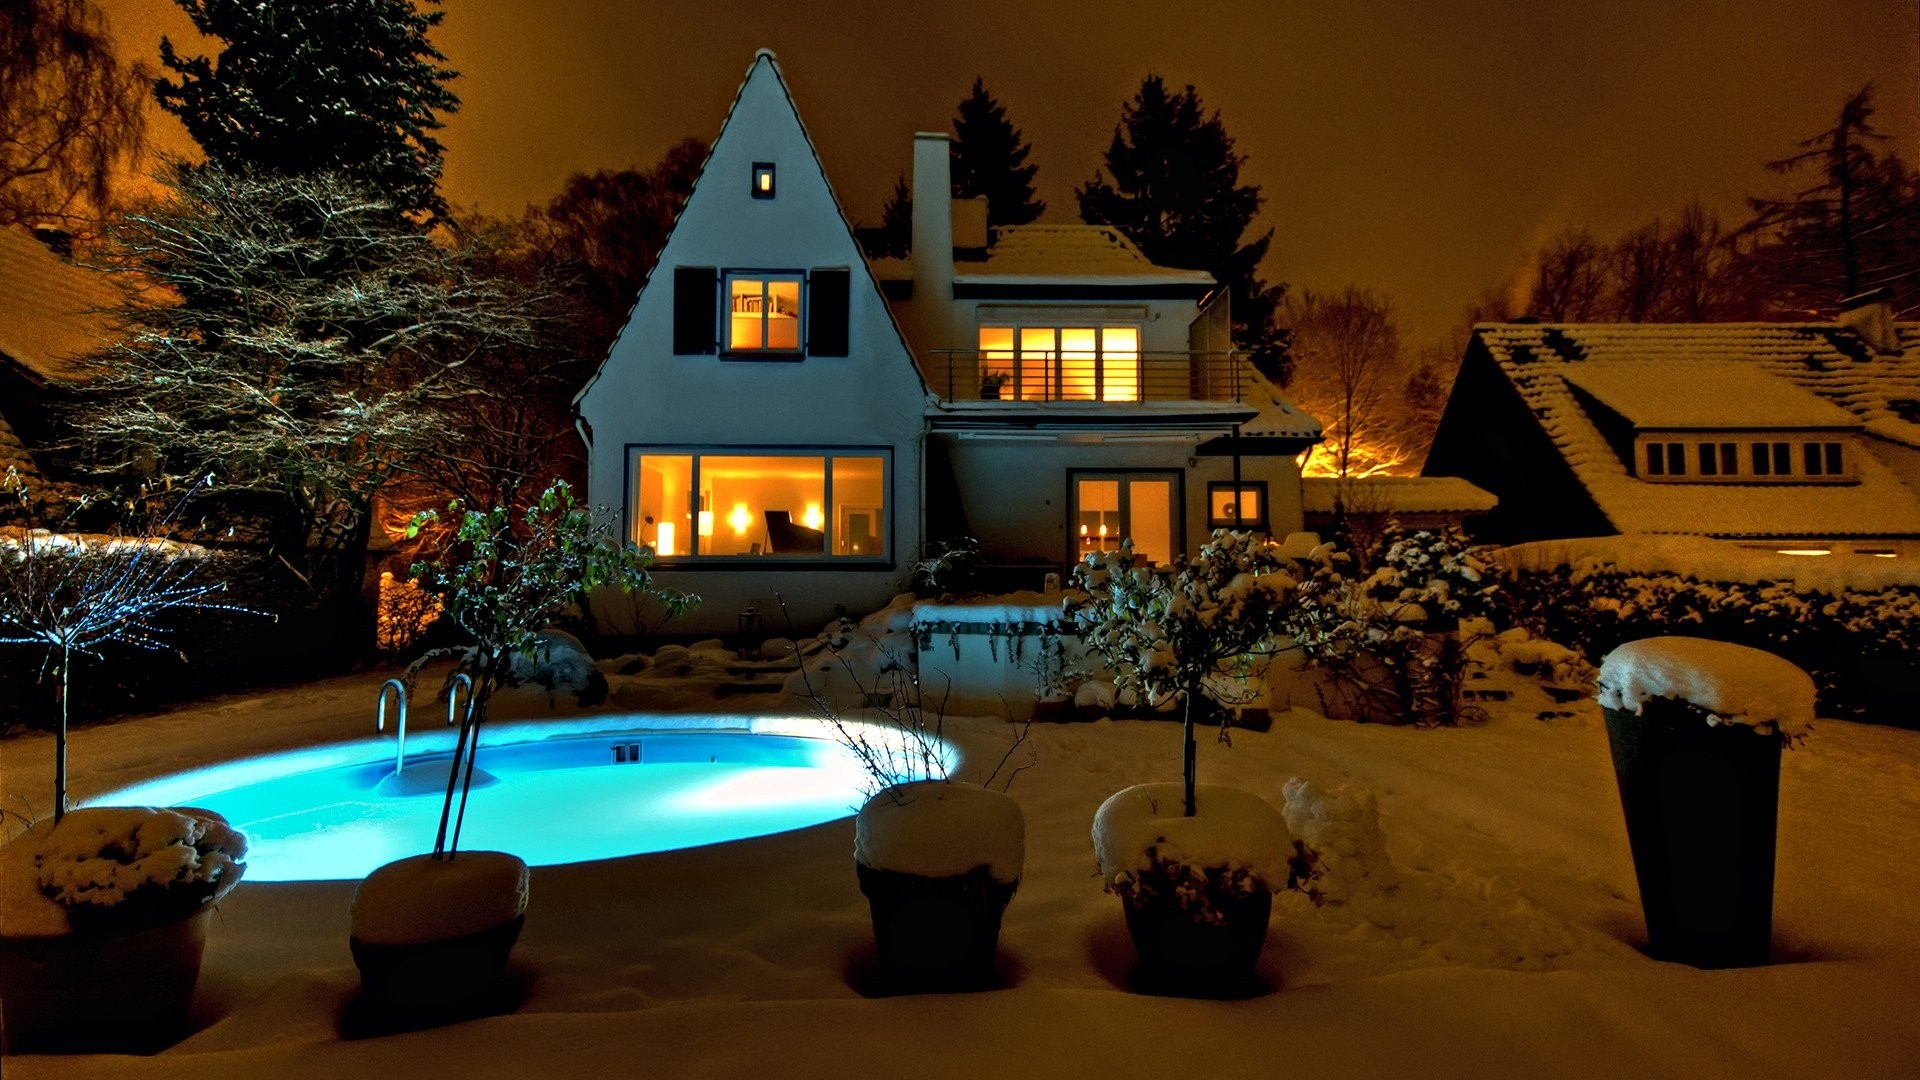 Cozy House Outside HD Wallpaper